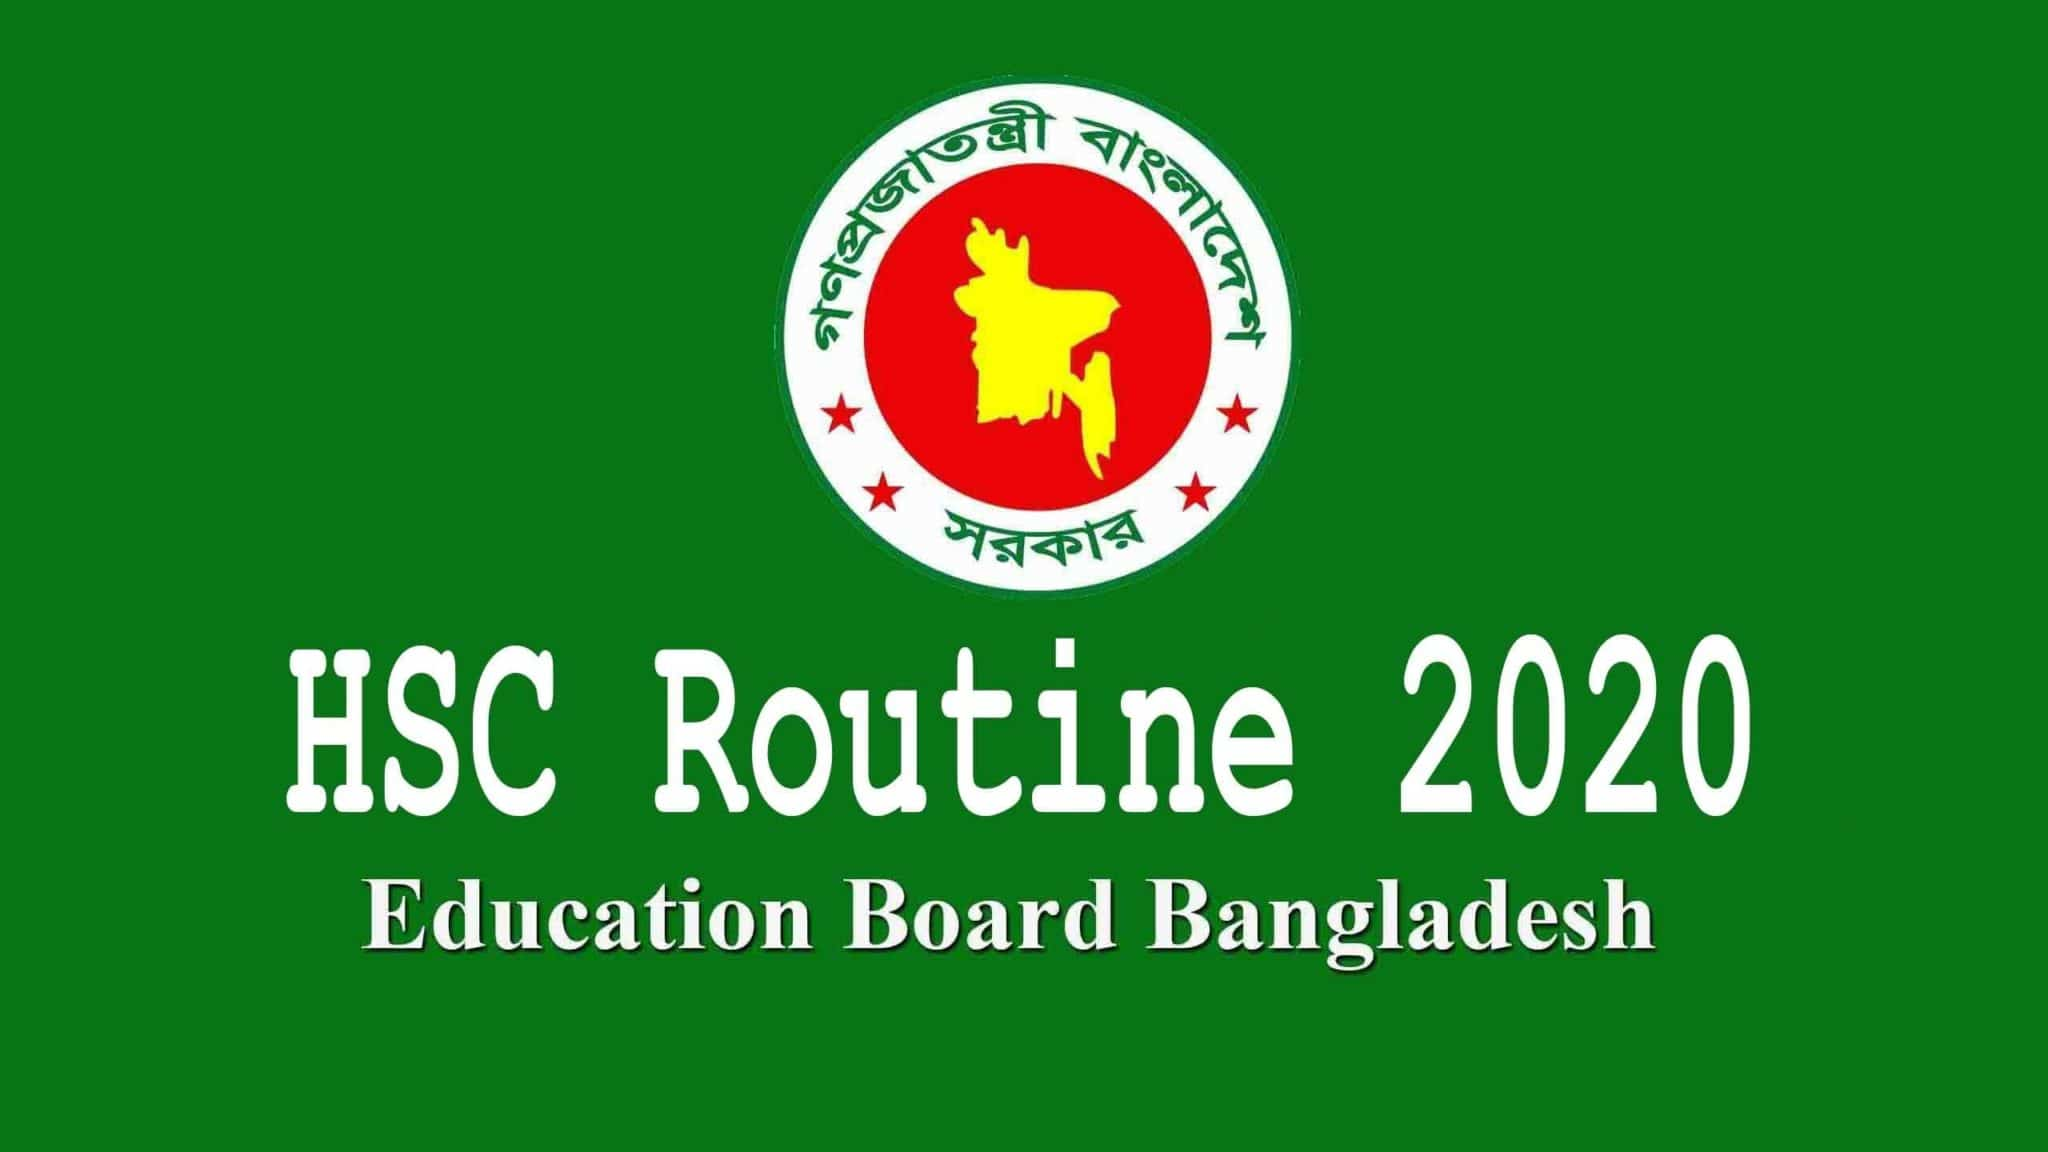 HSC Routine 2020 PDF Download | All Board BD